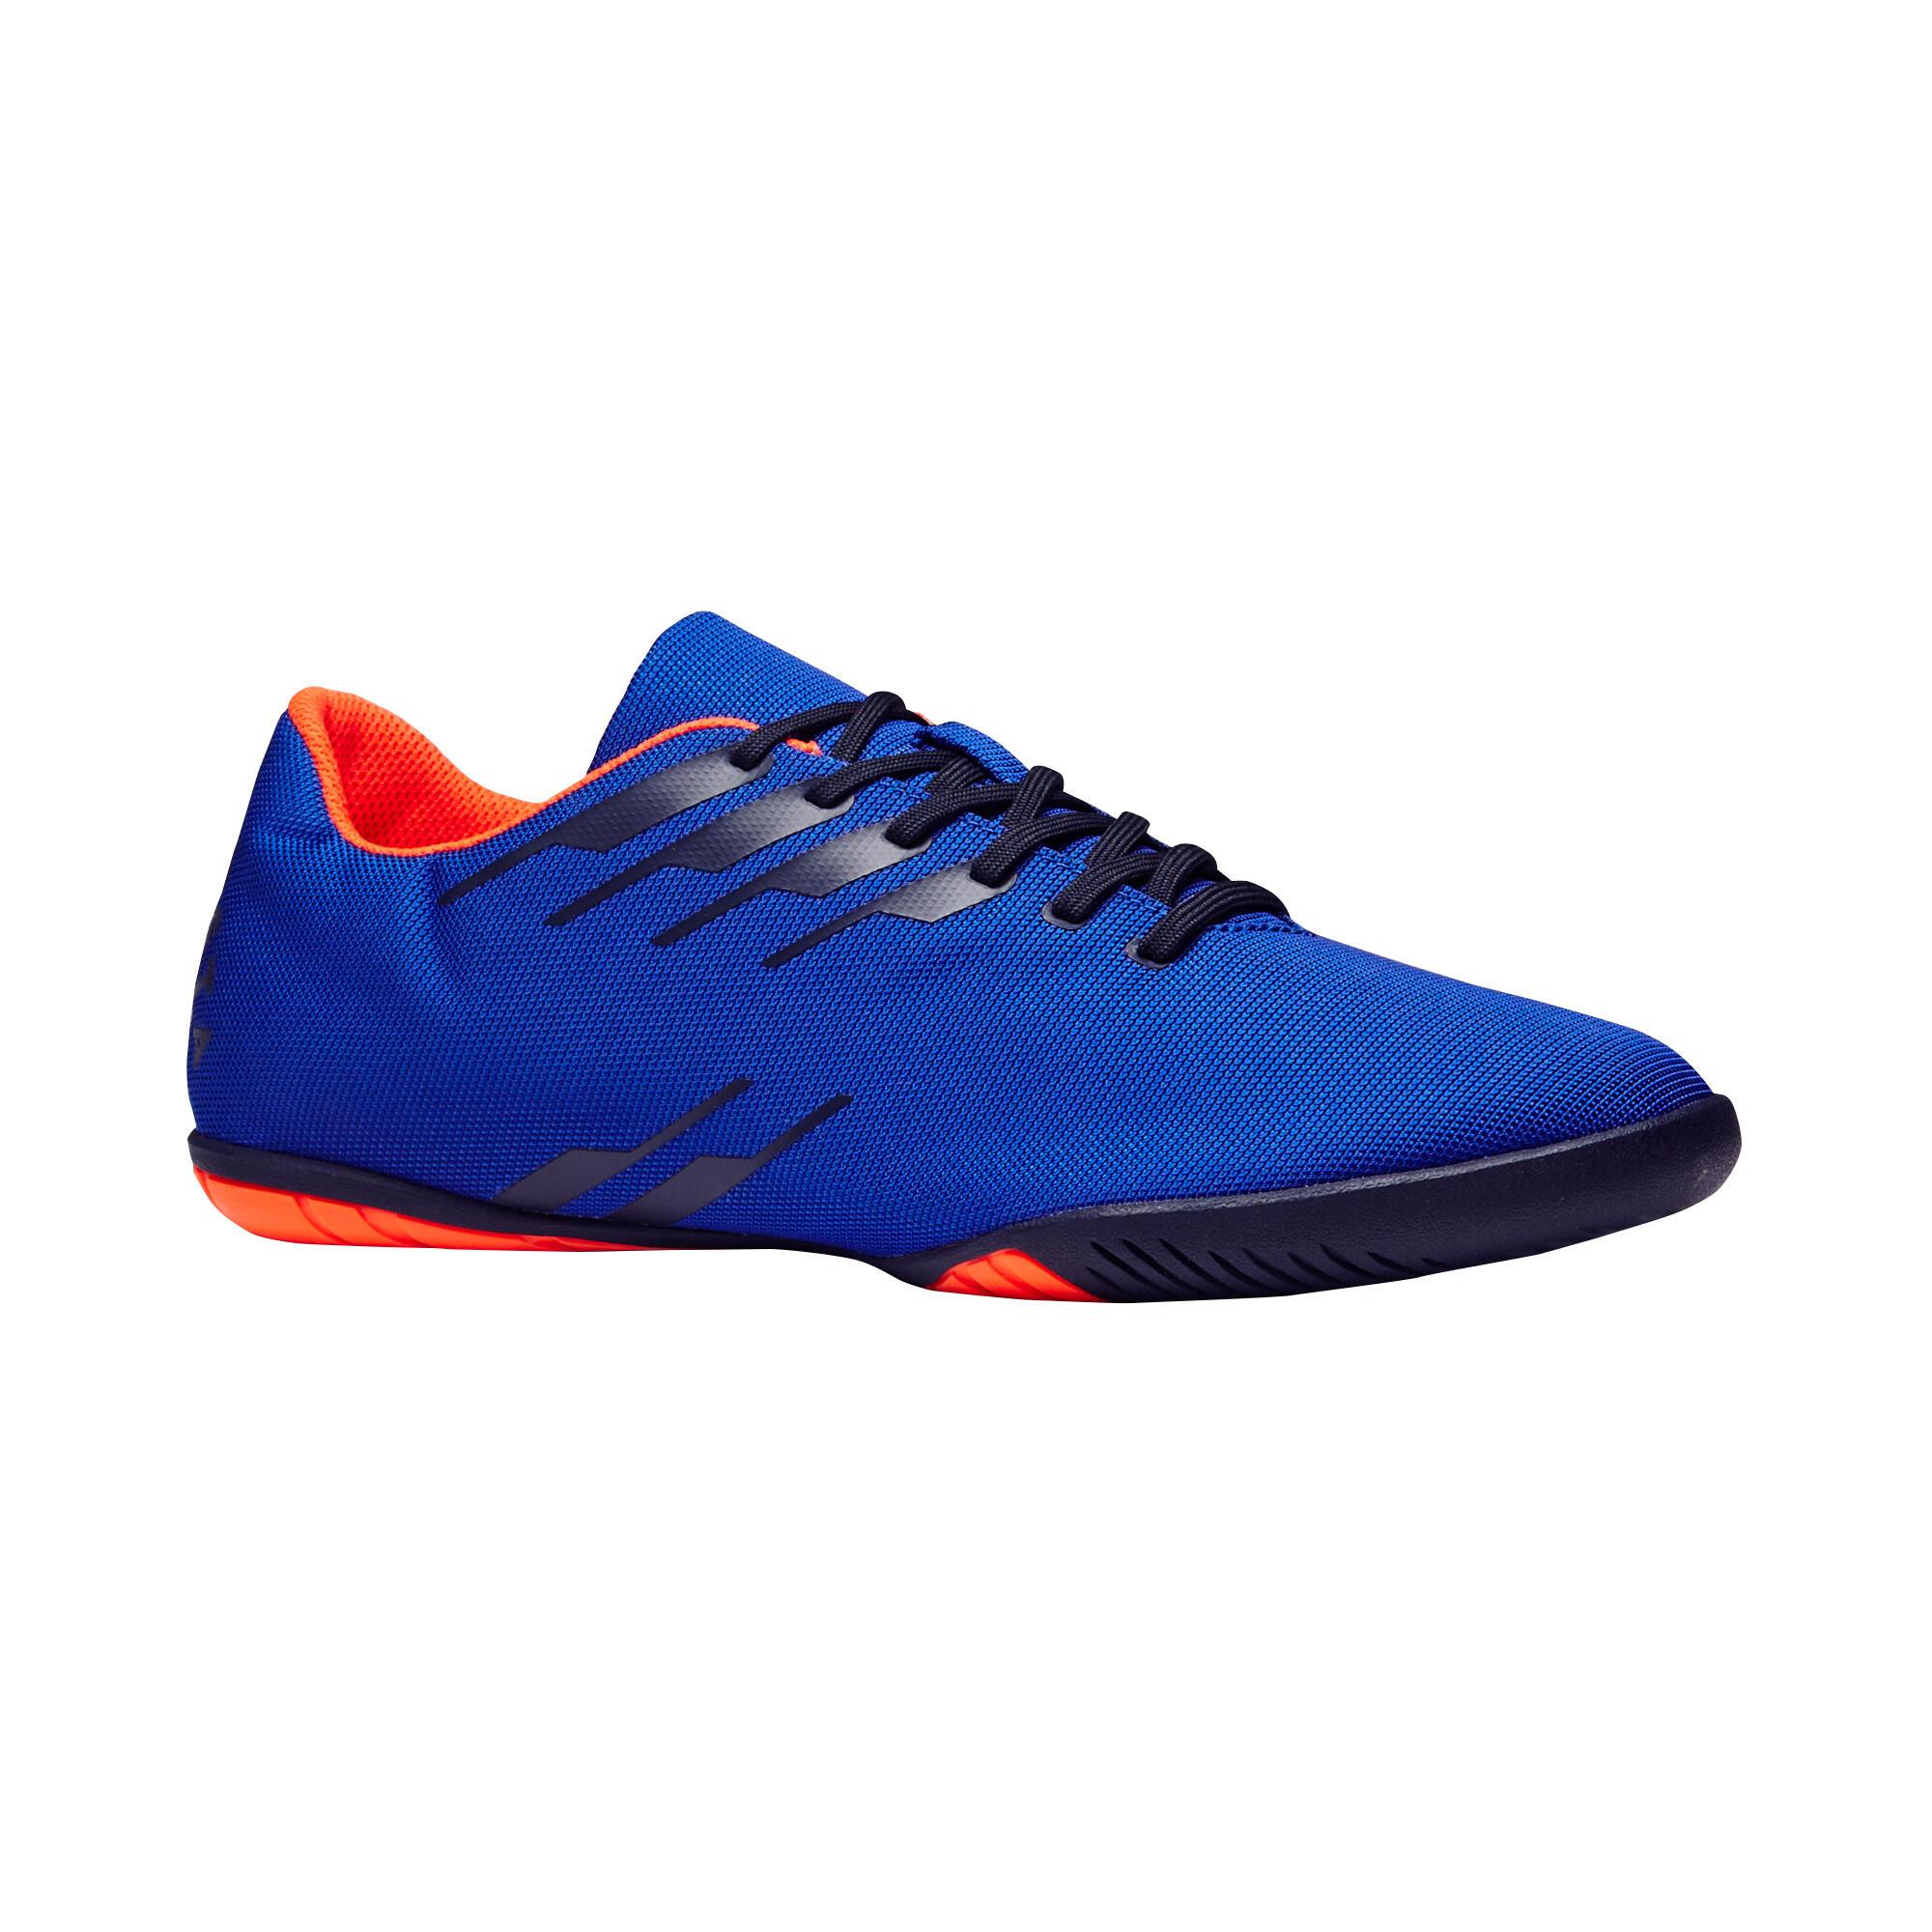 new product 43230 2b5b5 Futsalschuhe (Halle, Asphalt)  Sport erleben  DECATHLON